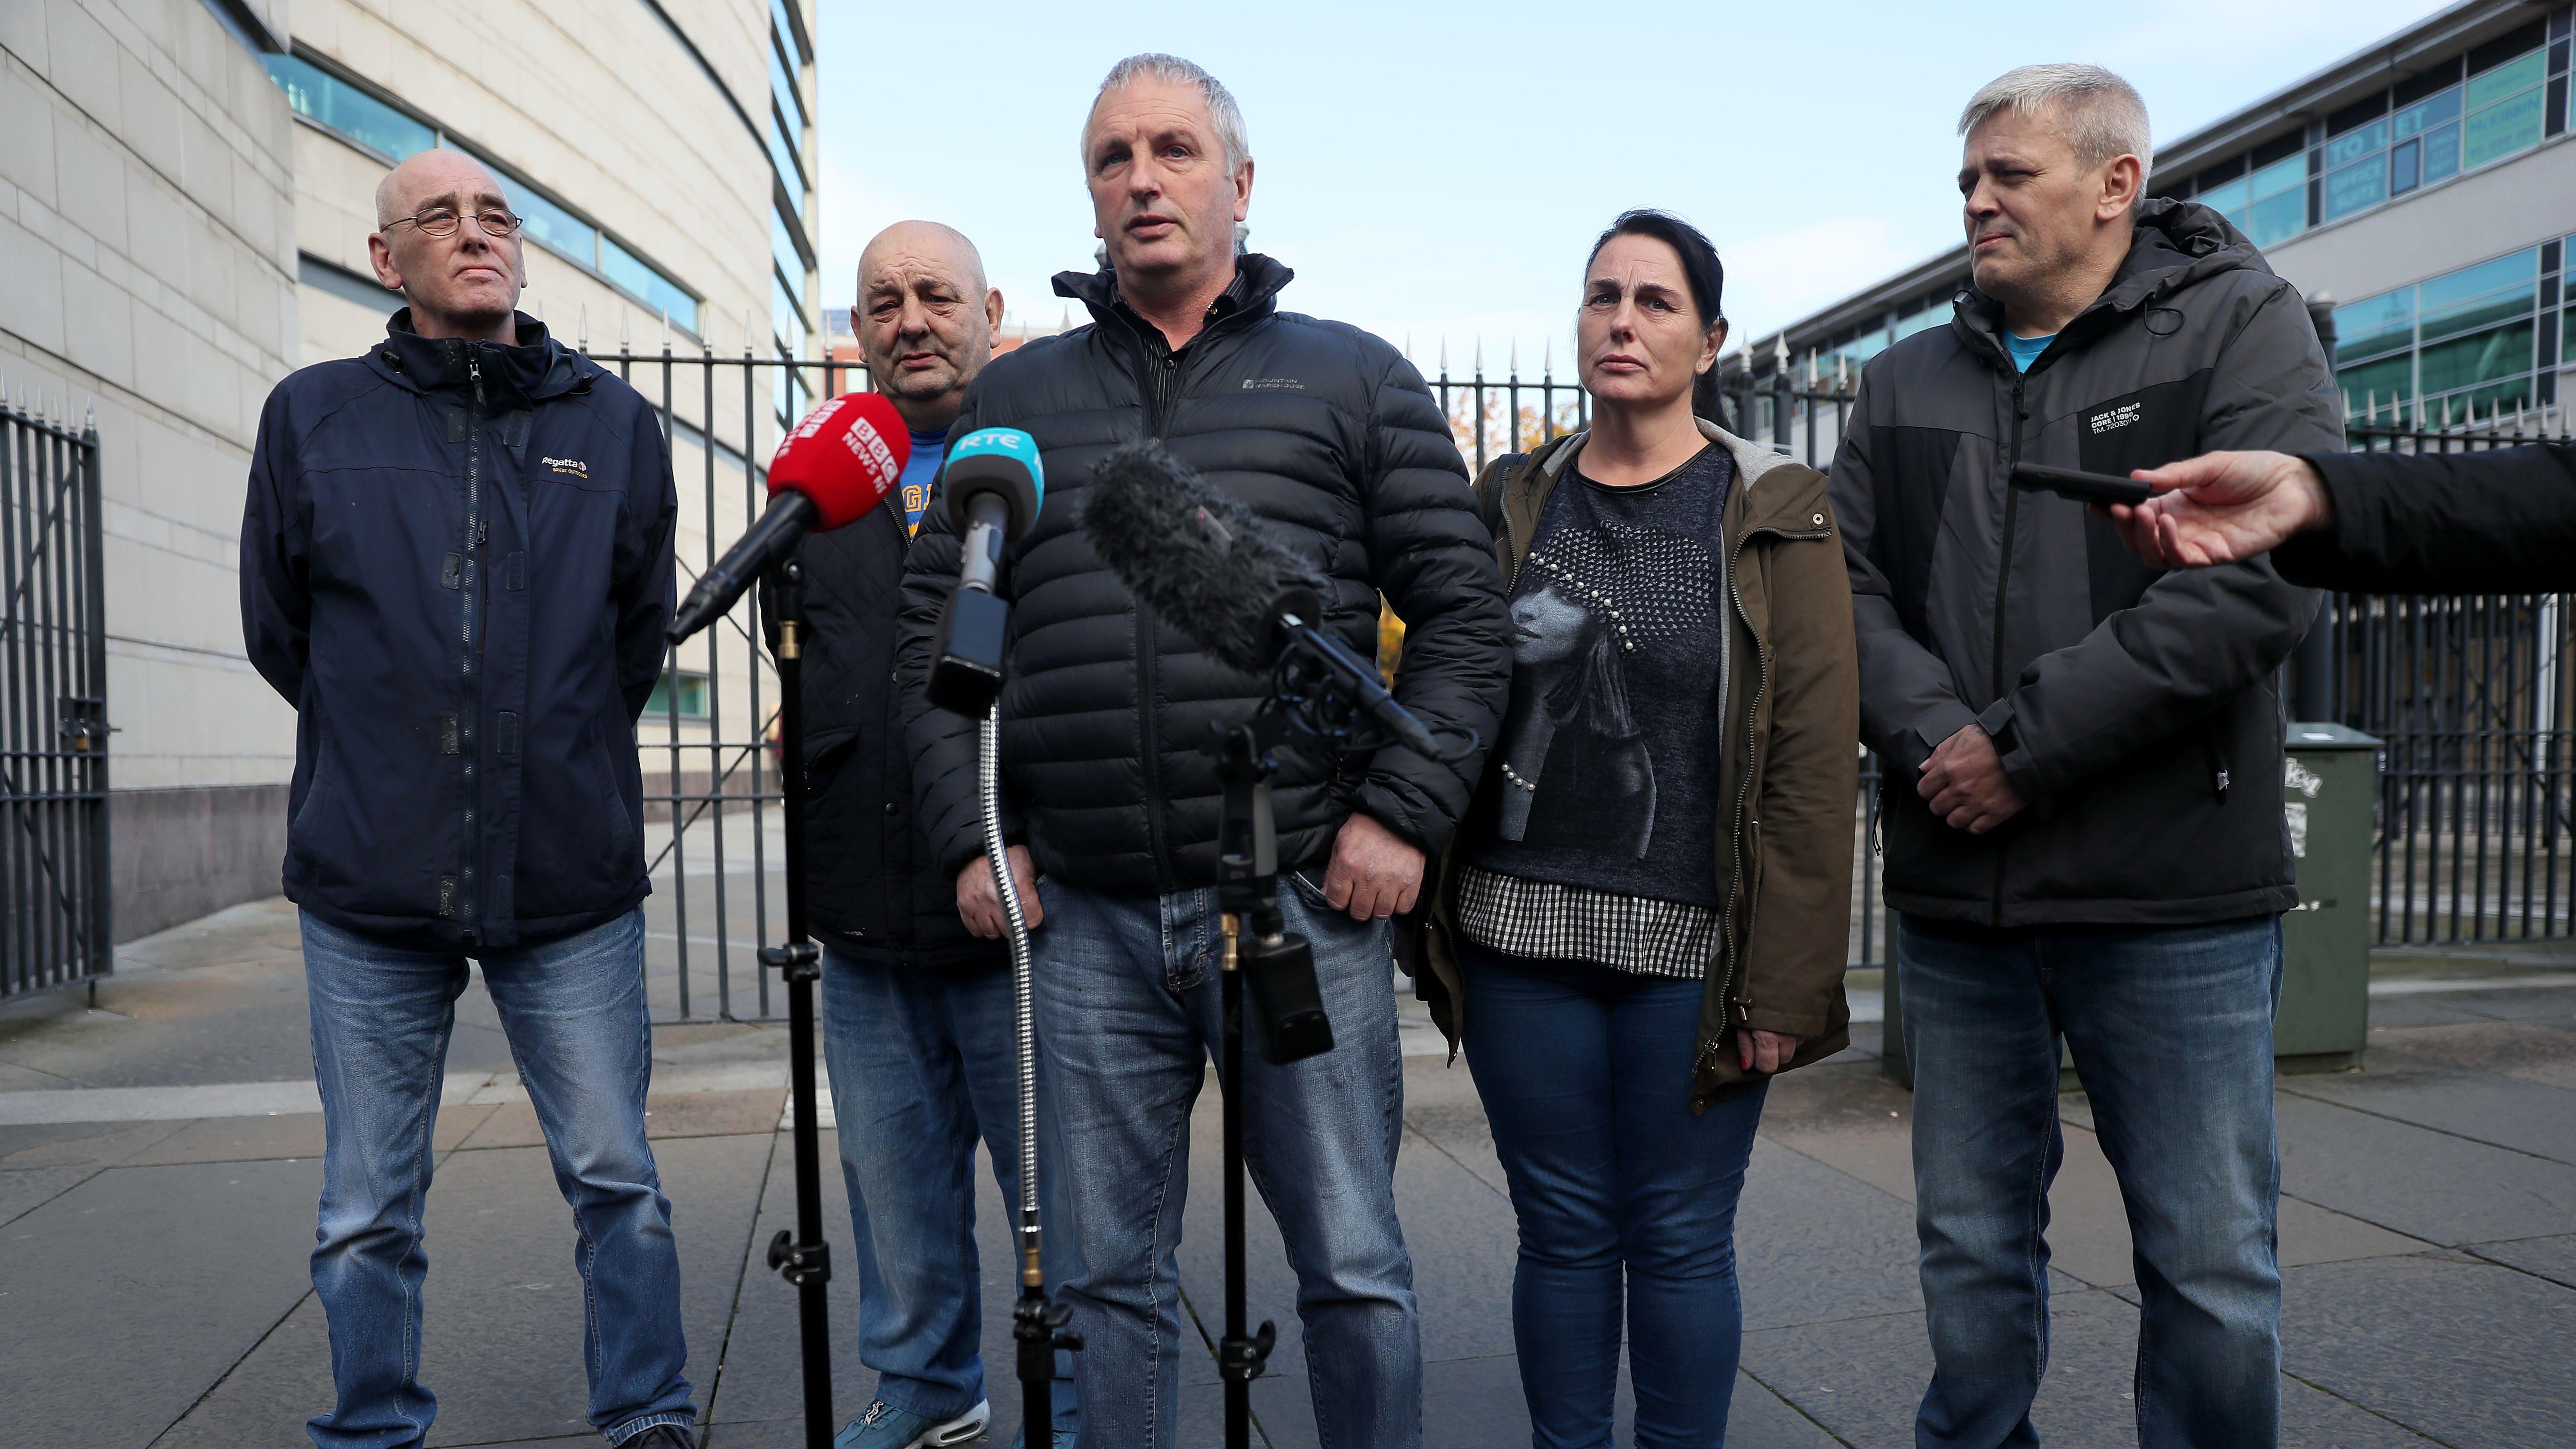 Jean McConville's children speak to the media outside Belfast Crown Court